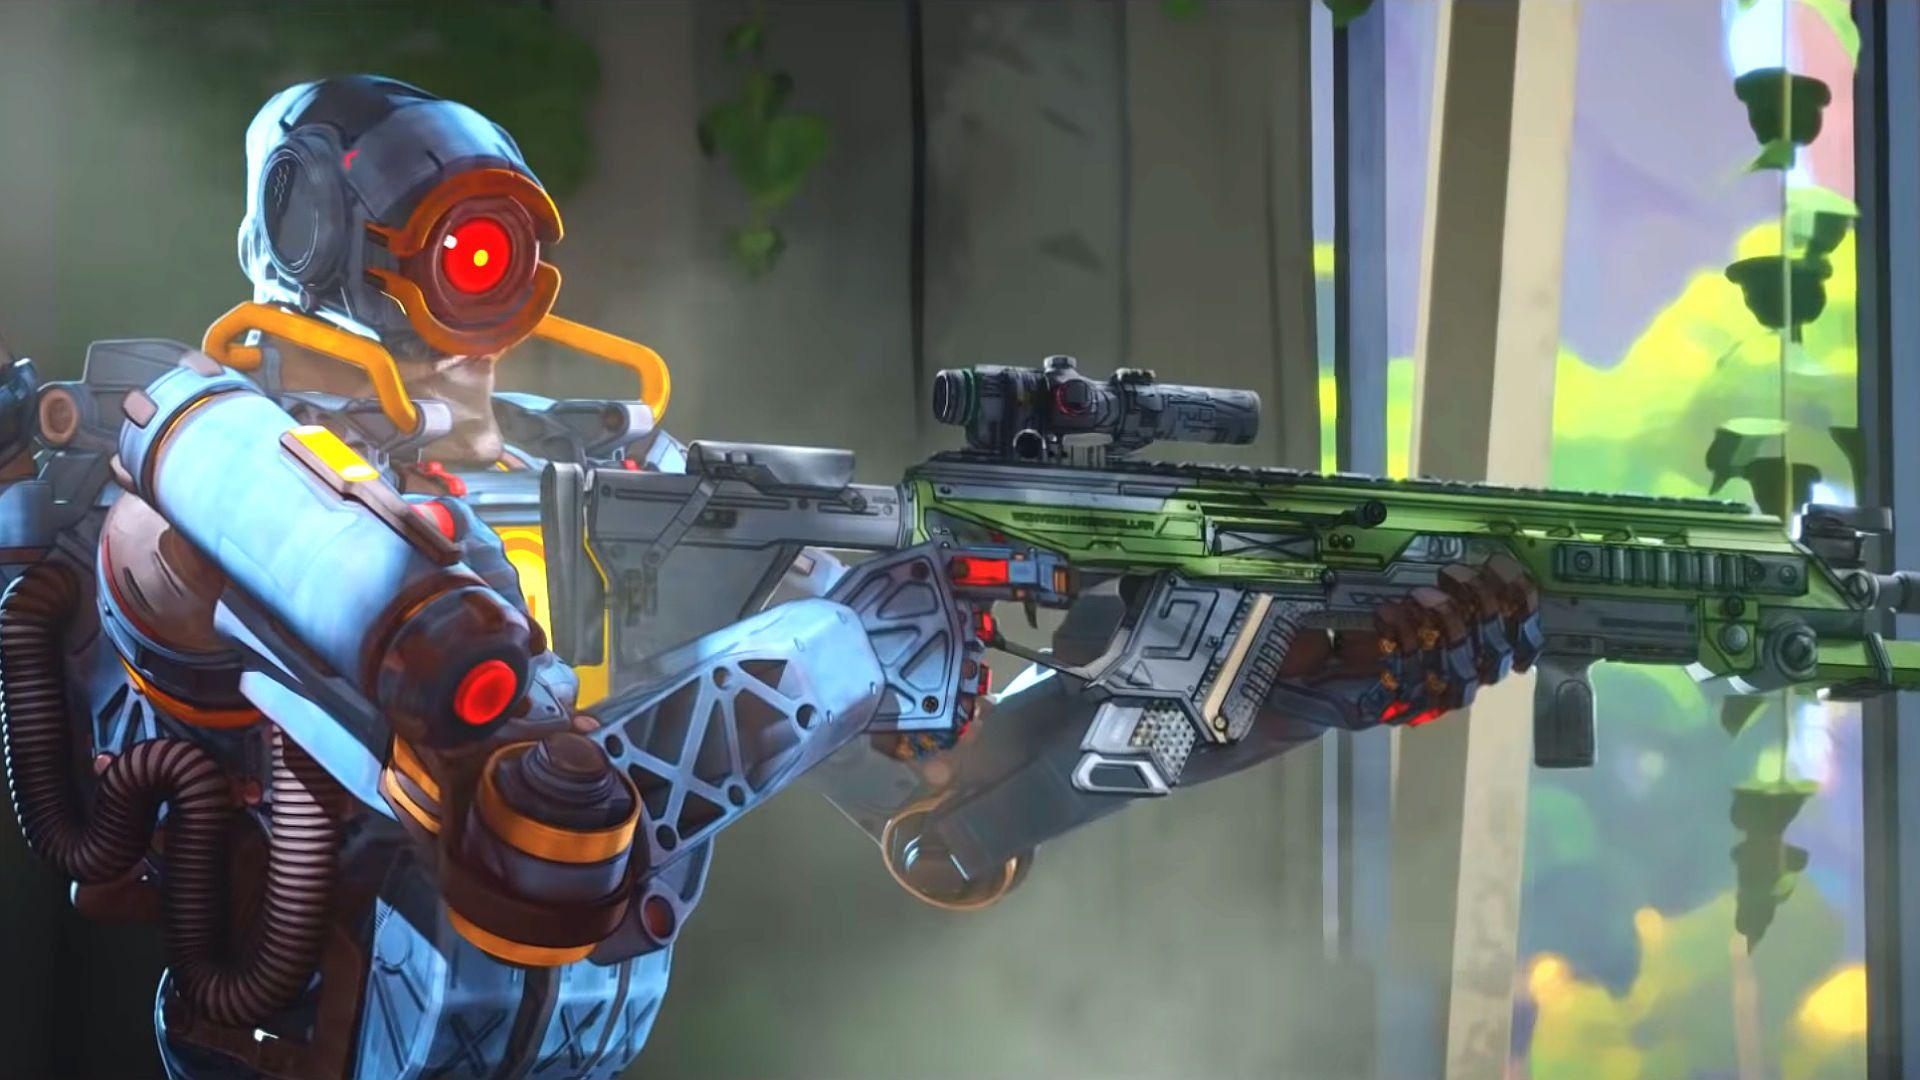 Titanfall recupero lista di matchmaking 360